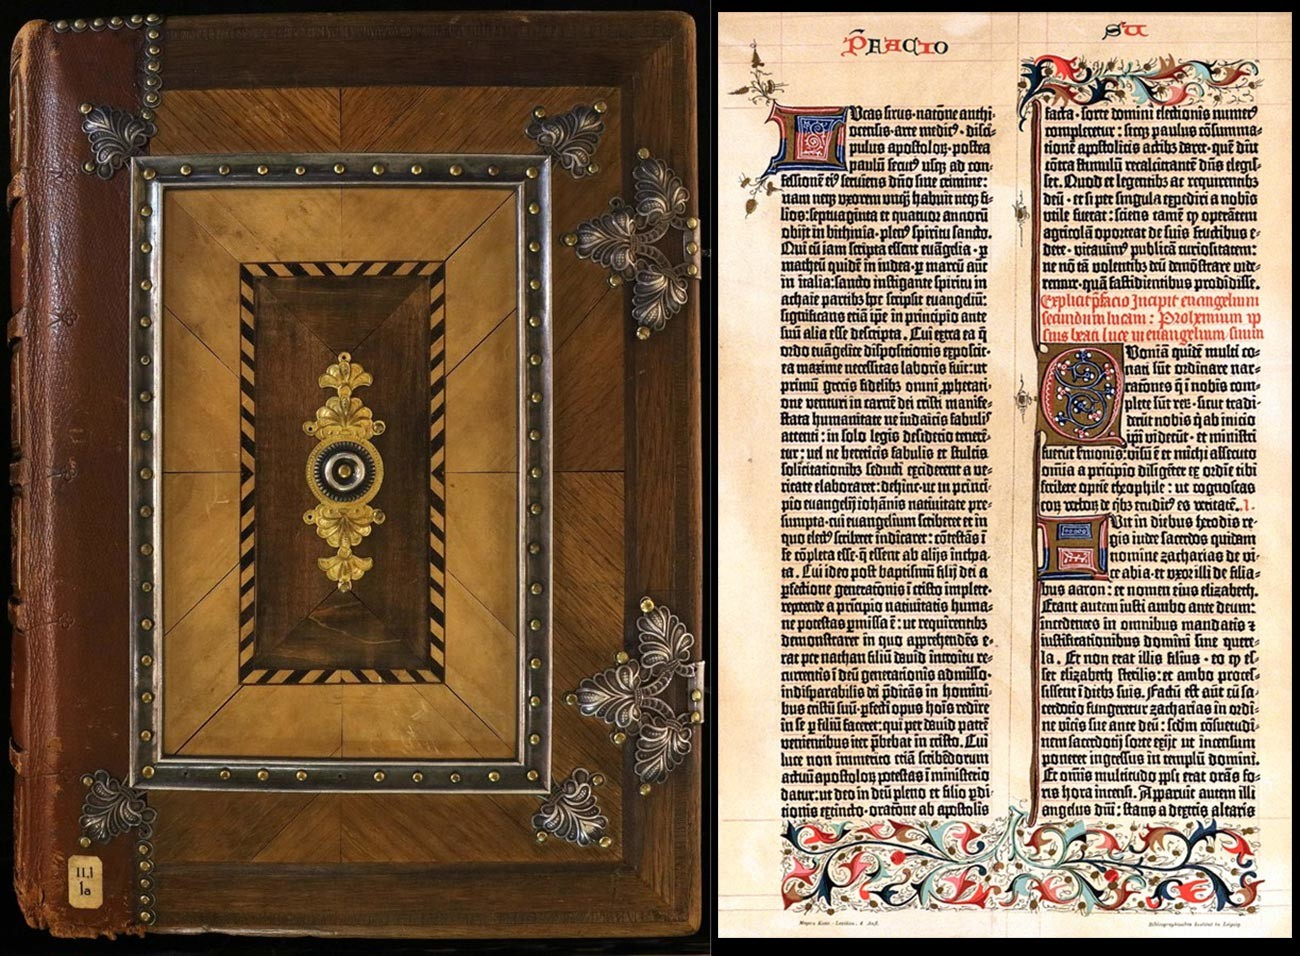 Una delle due Bibbie stampate da Johannes Gutenberg